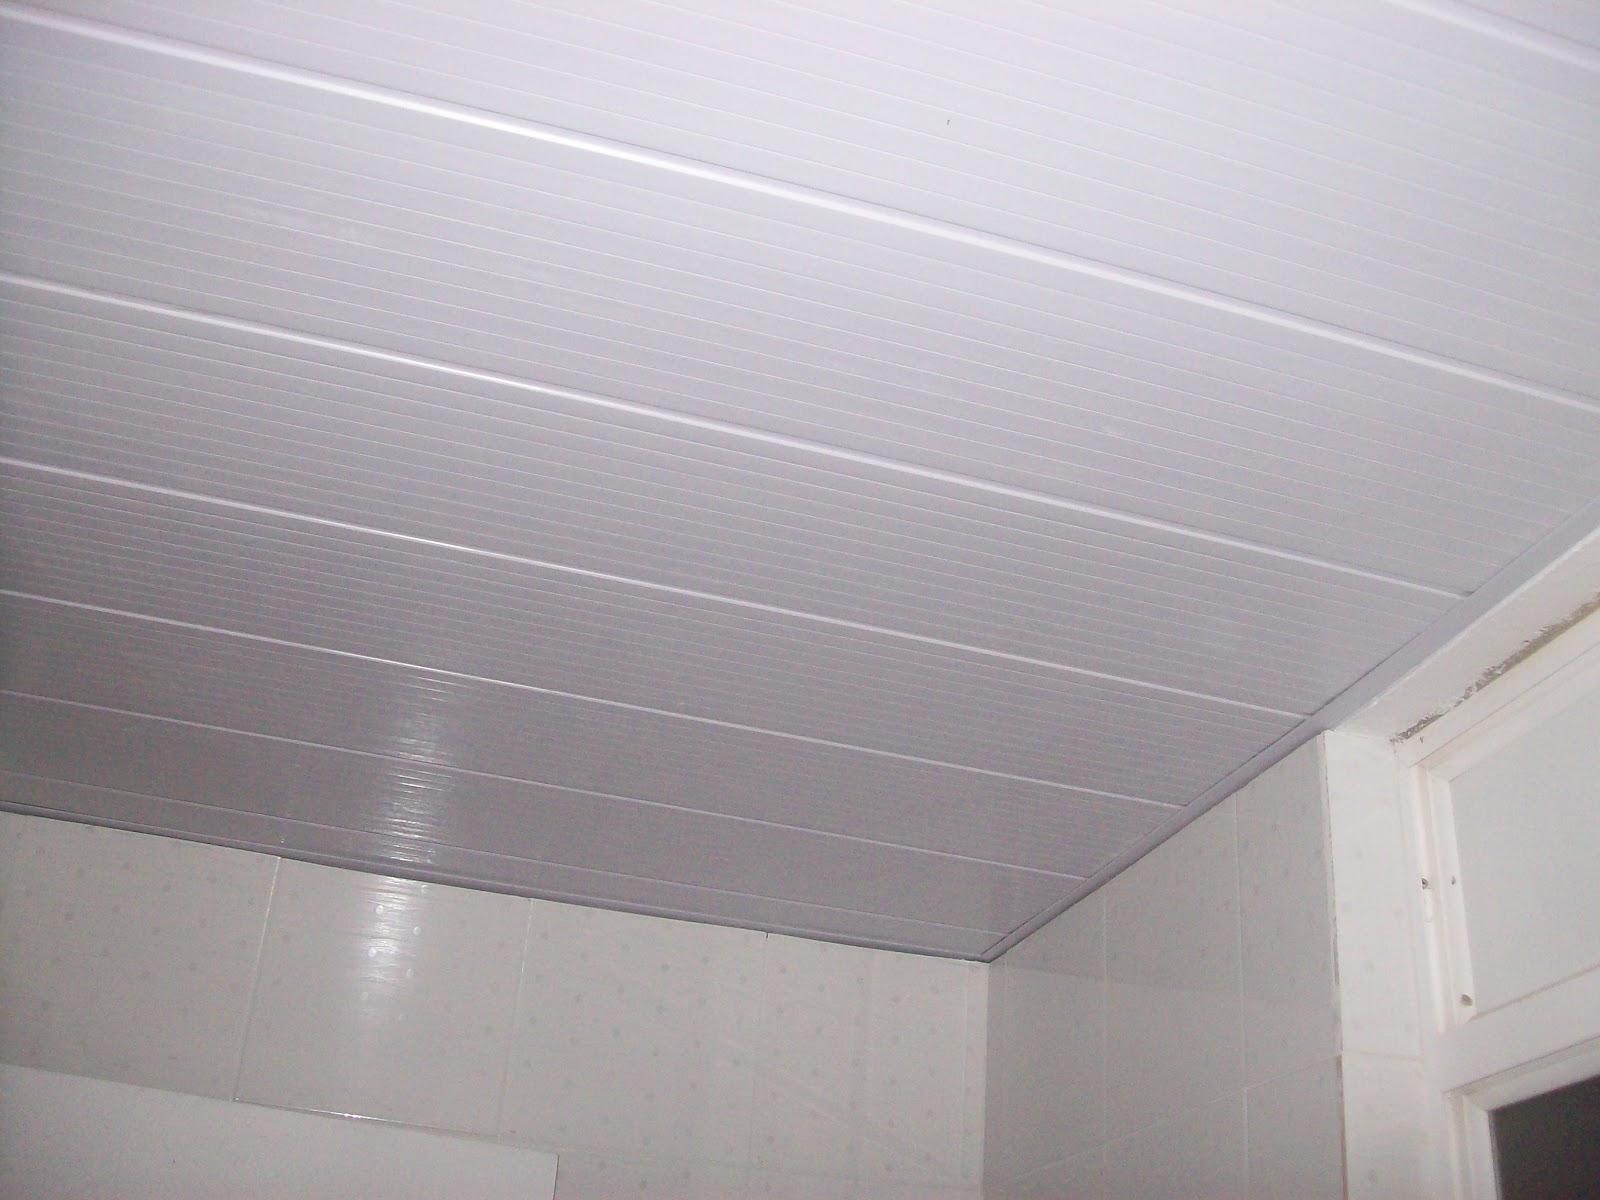 Ferry pvc suministro materiales e instalacion techos - Falsos techos pvc ...